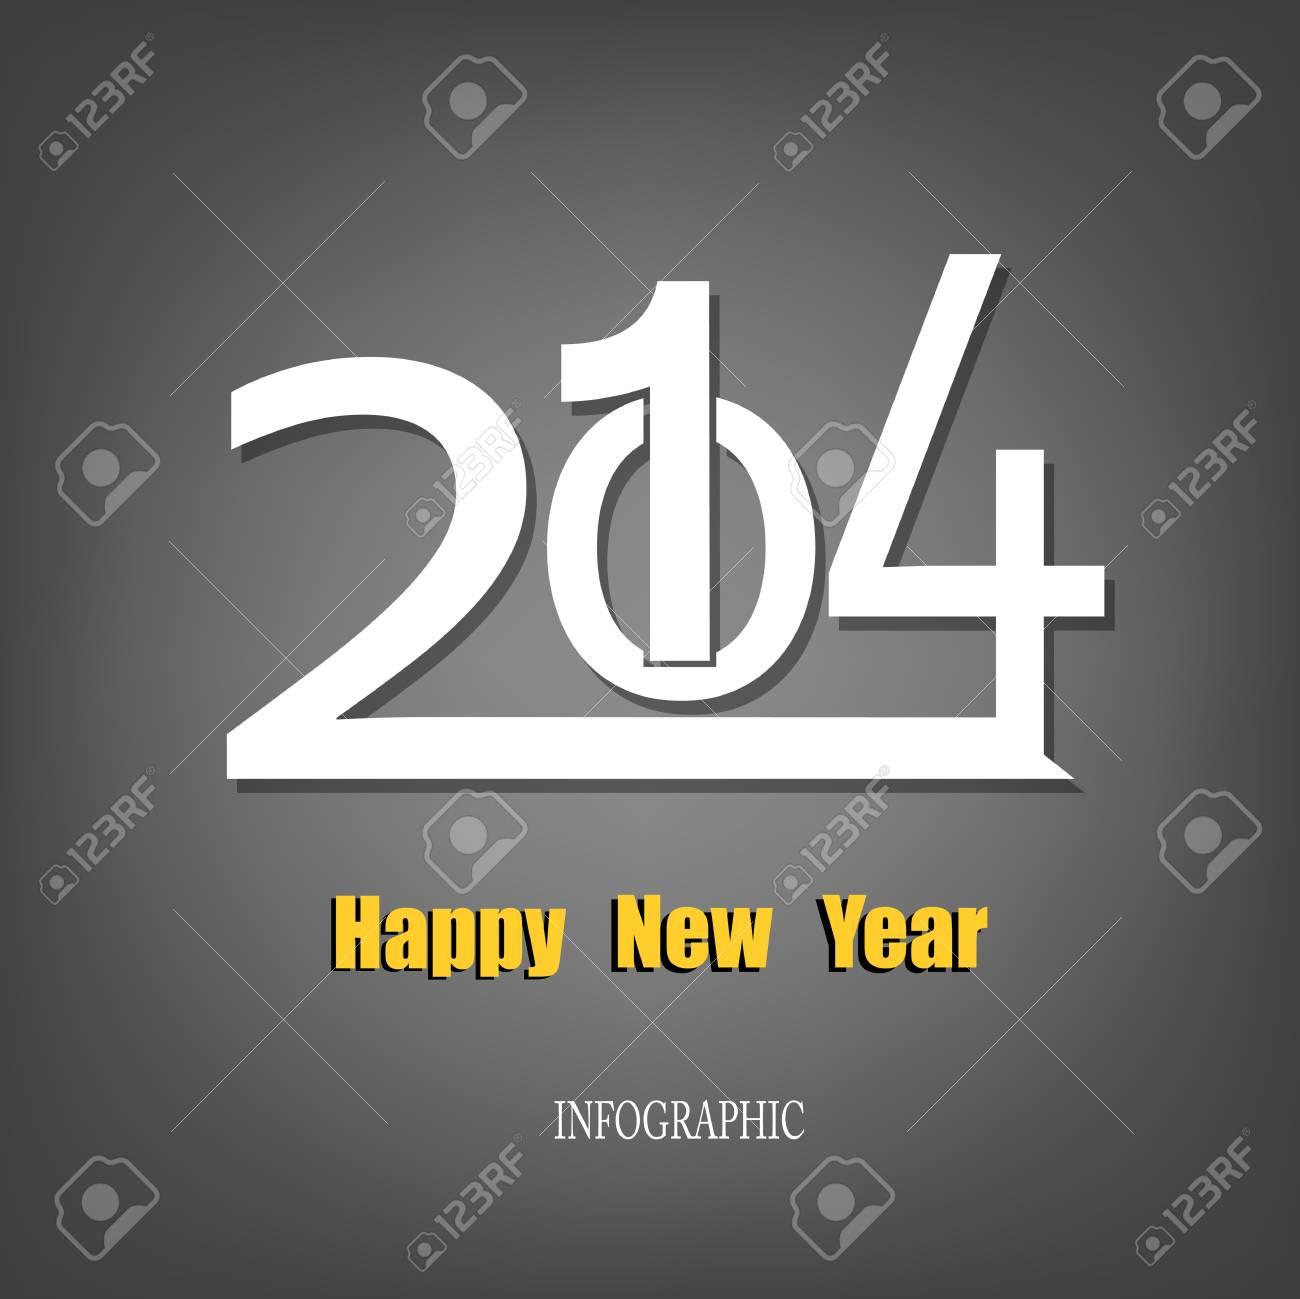 Creative Happy New Year 2014 Infographic Calendars Vector Stock Vector - 22951497